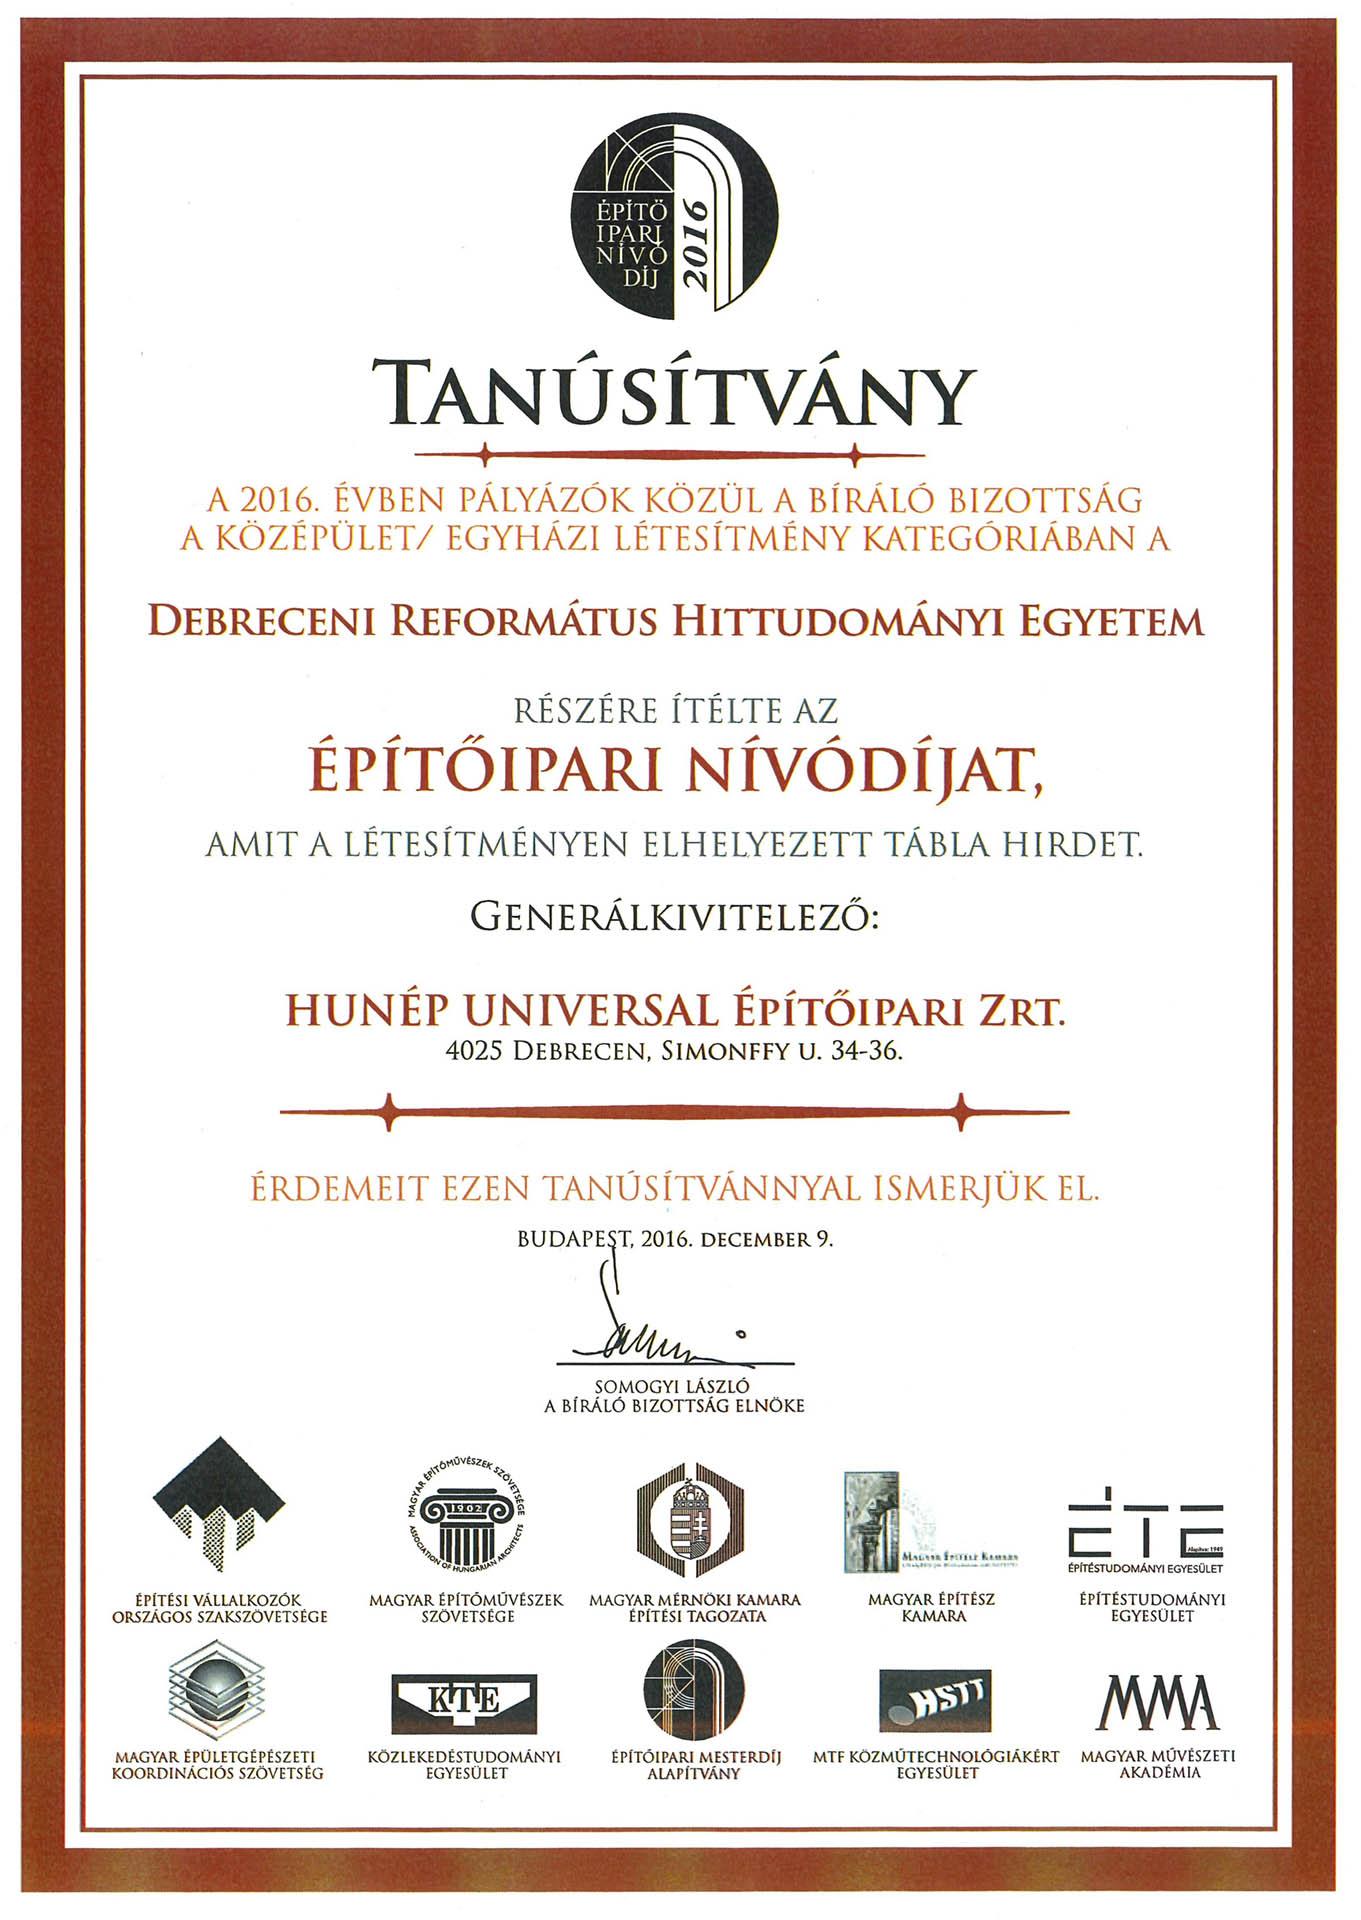 Debreceni Református Hittudományi Egyetem